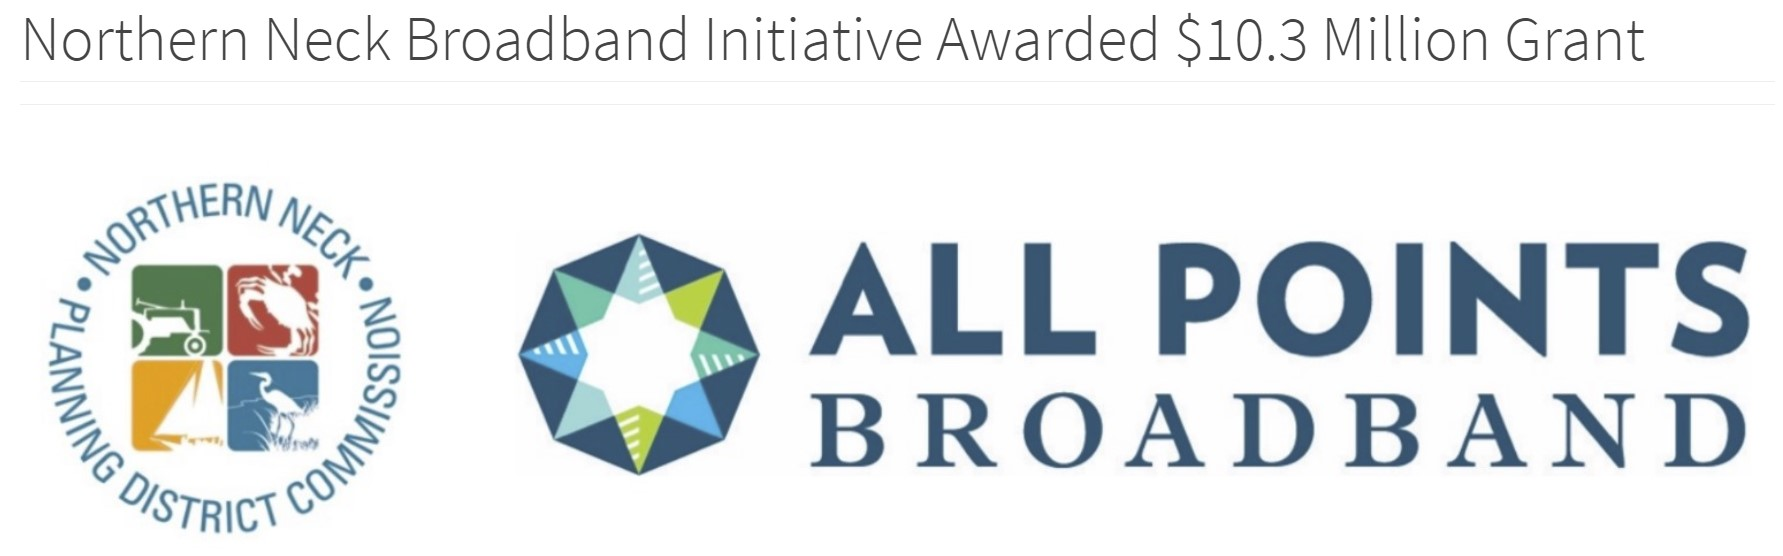 Northern Neck Broadband Initiative Awarded $10.3 Million Grant